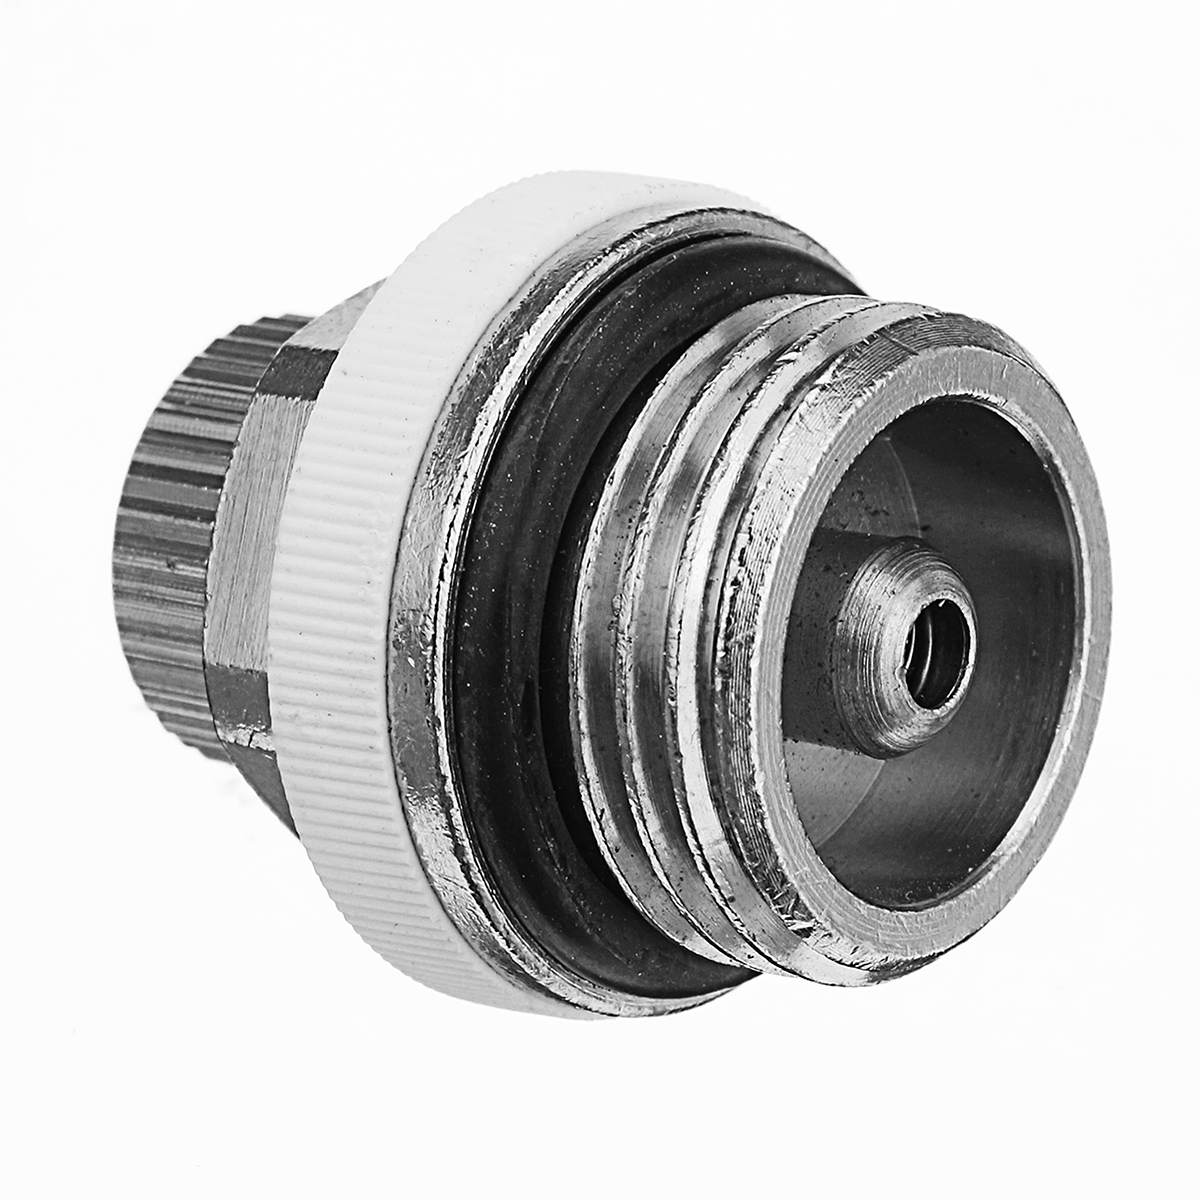 Válvula de radiador autosangrante de ventilación automática de aire de cobre de 1/2 pulgadas 30x30mm para radiador de calefacción de ventilación